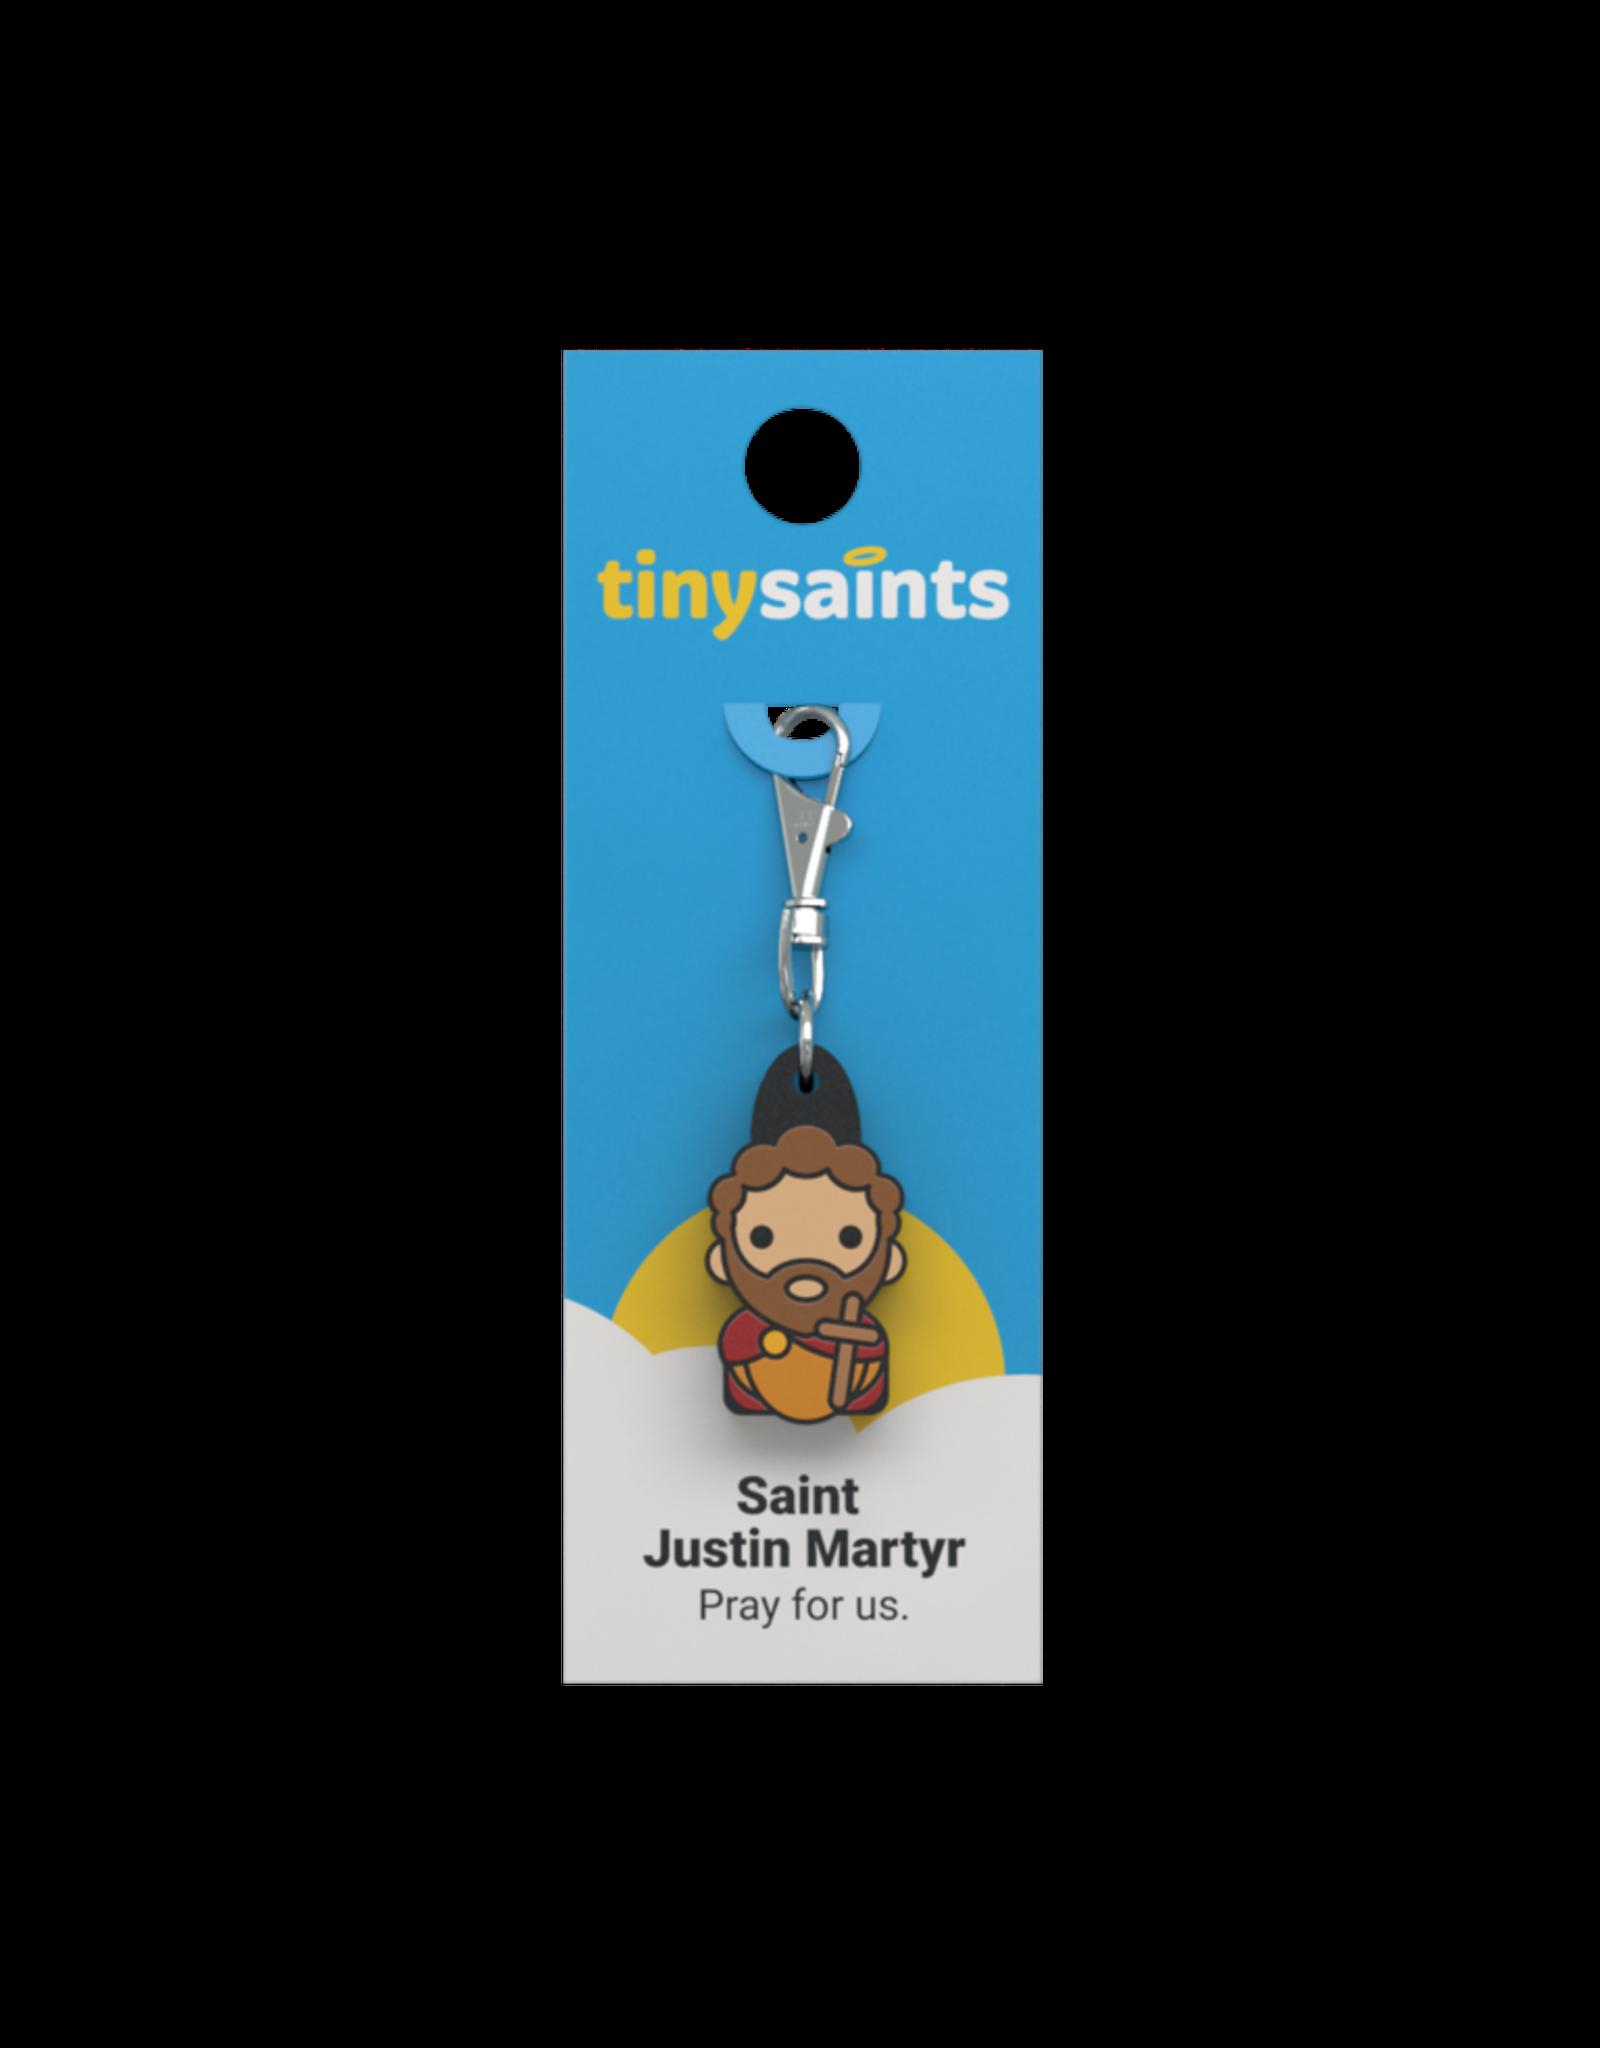 Tiny Saints Tiny Saints Charm - St. Justin the Martyr